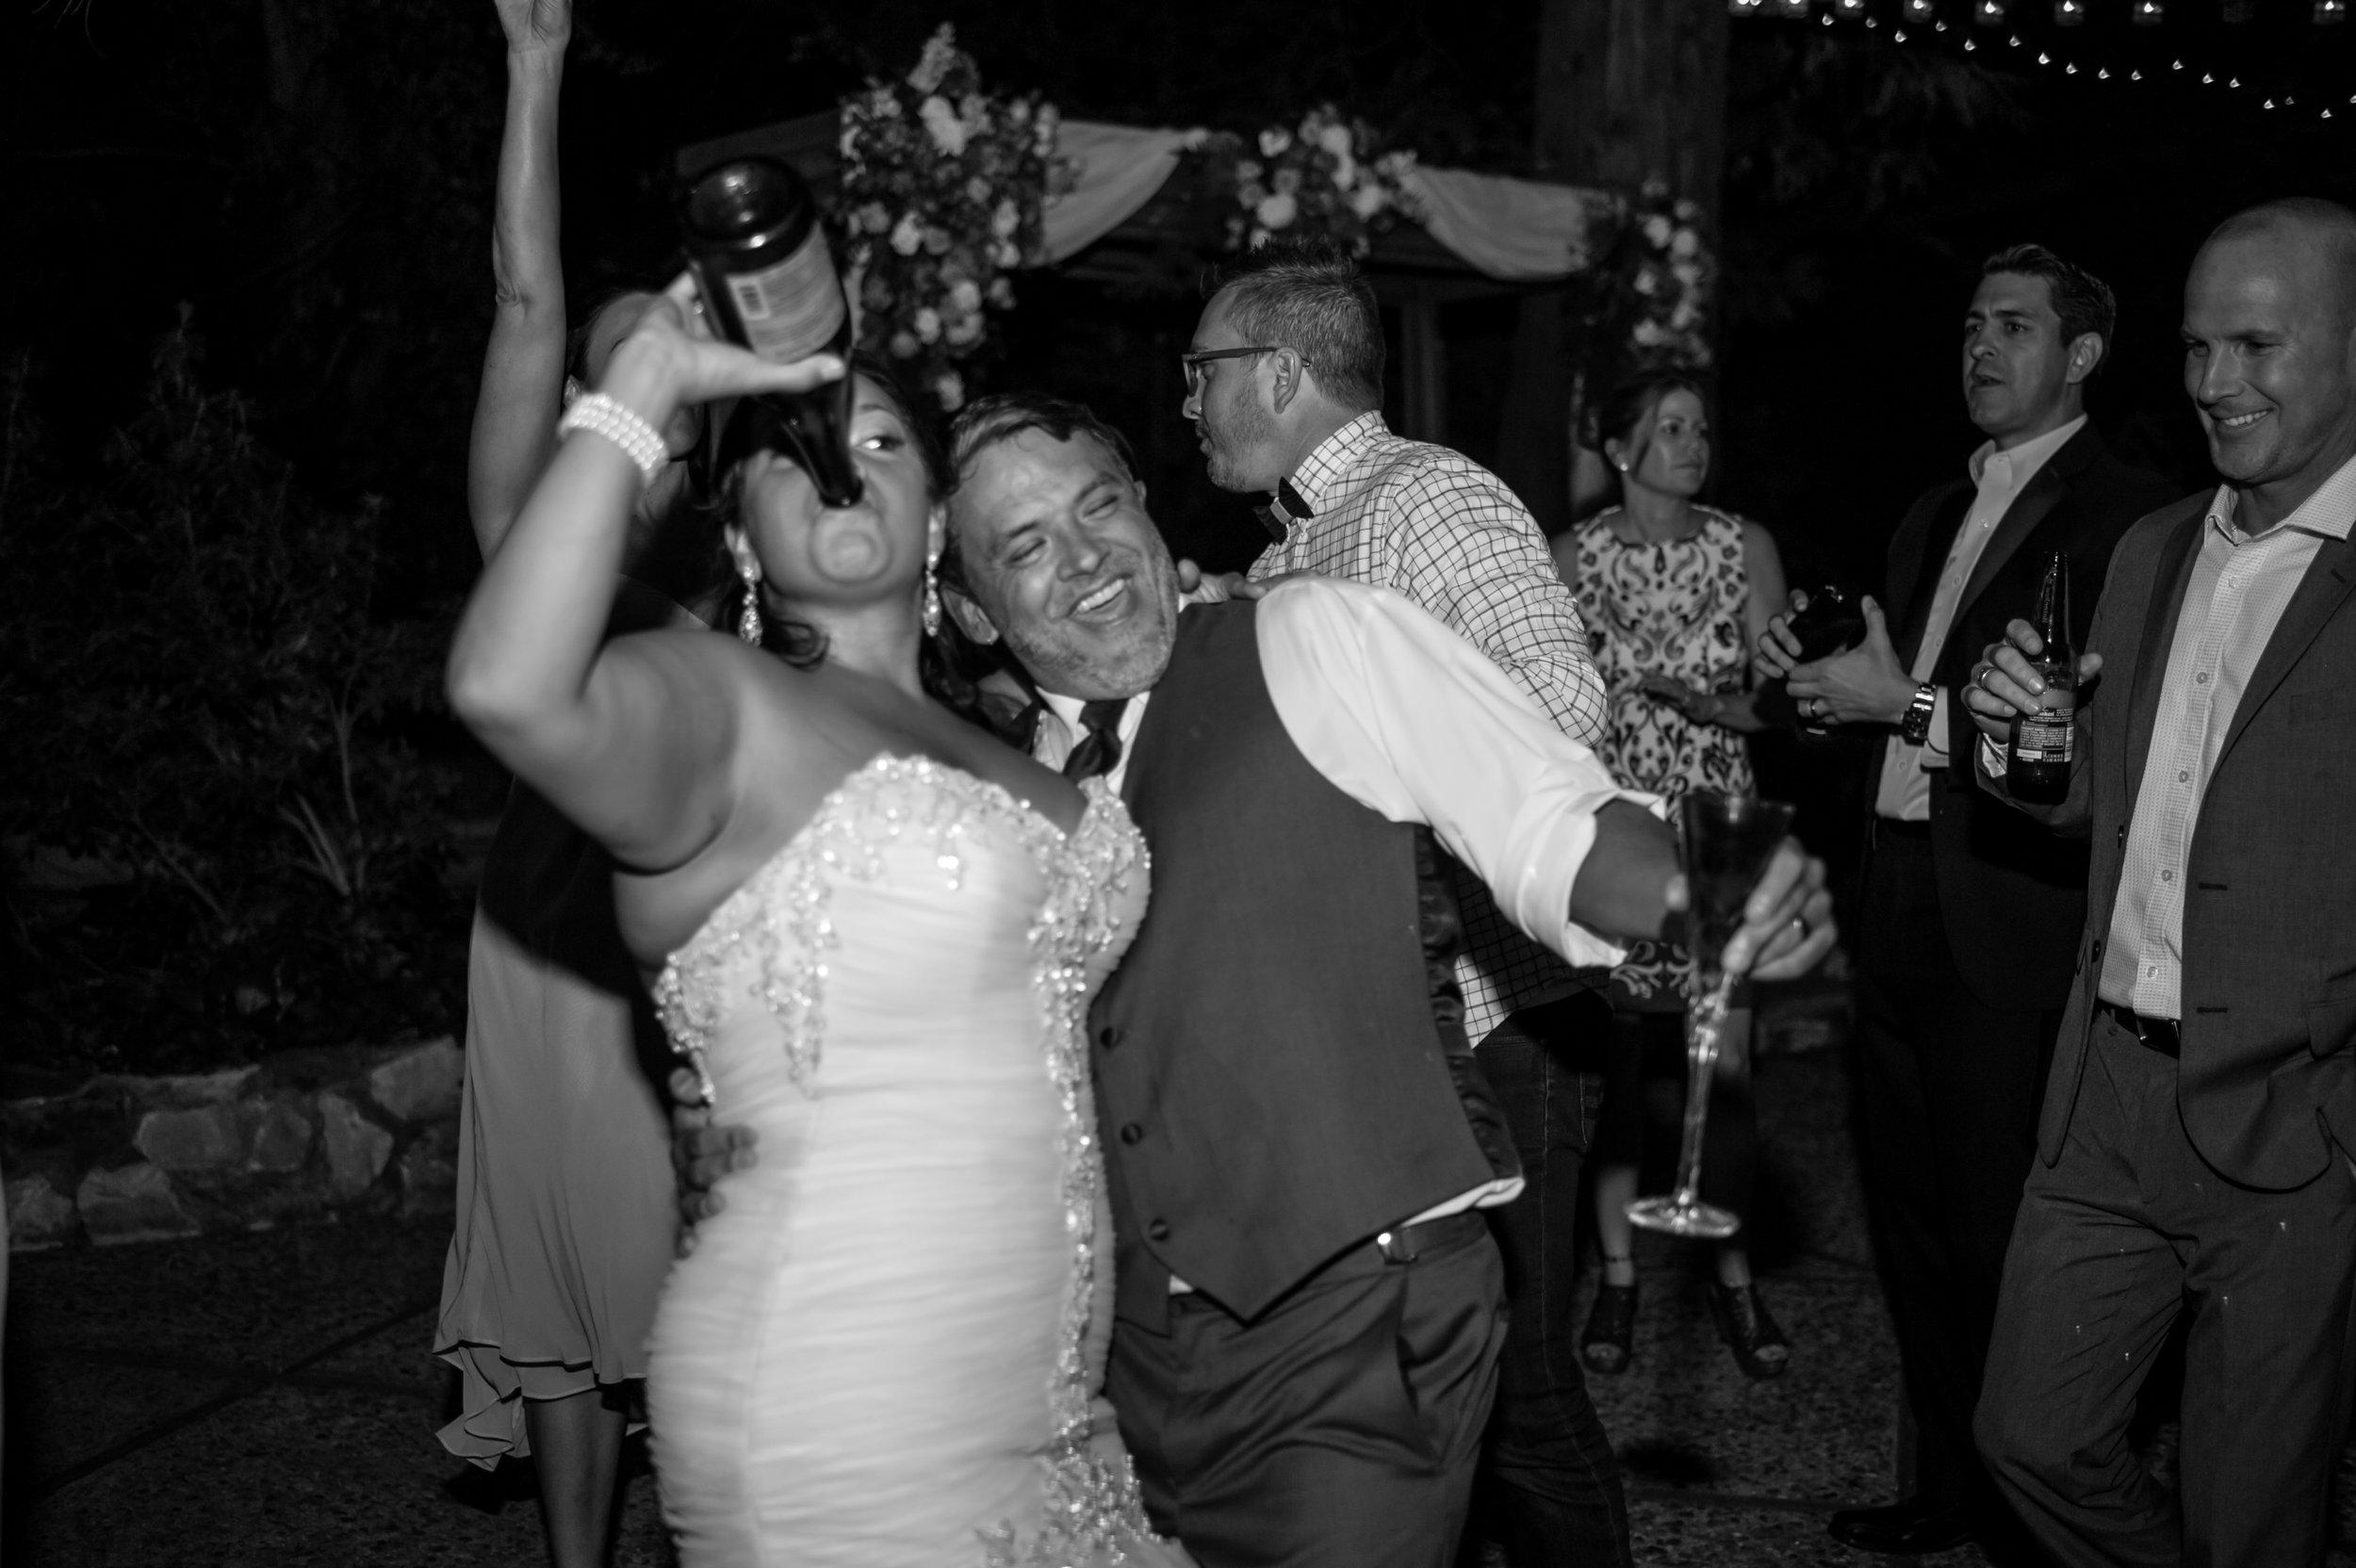 erika-seth-044-monte-verde-inn-sacramento-wedding-photographer-katherine-nicole-photography.JPG